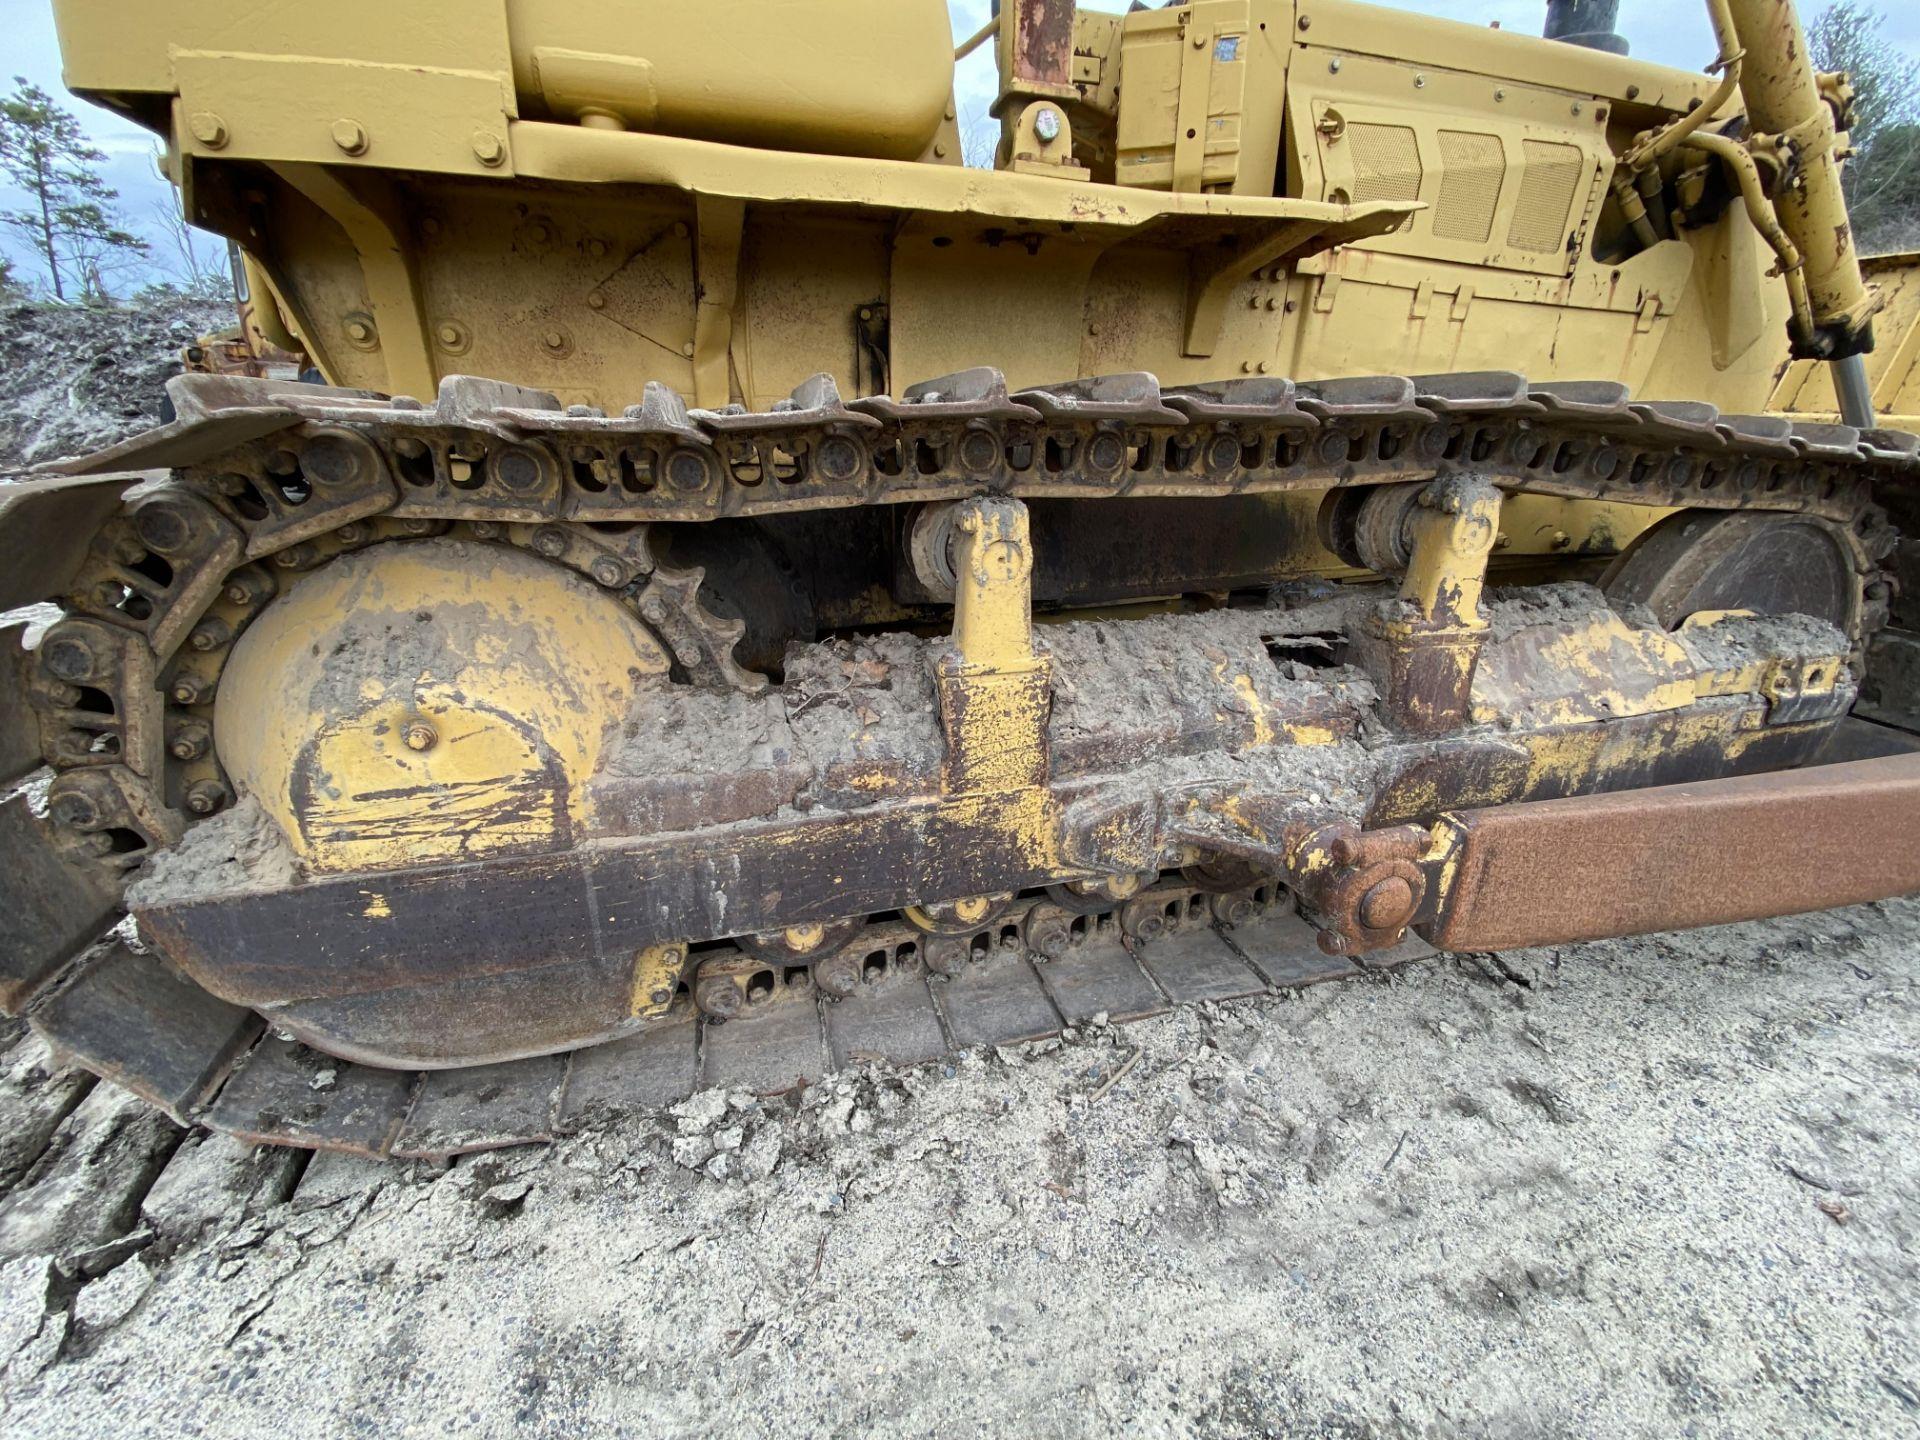 Komatsu D65E Crawler Dozer s/n N/A, No Title - Image 14 of 18